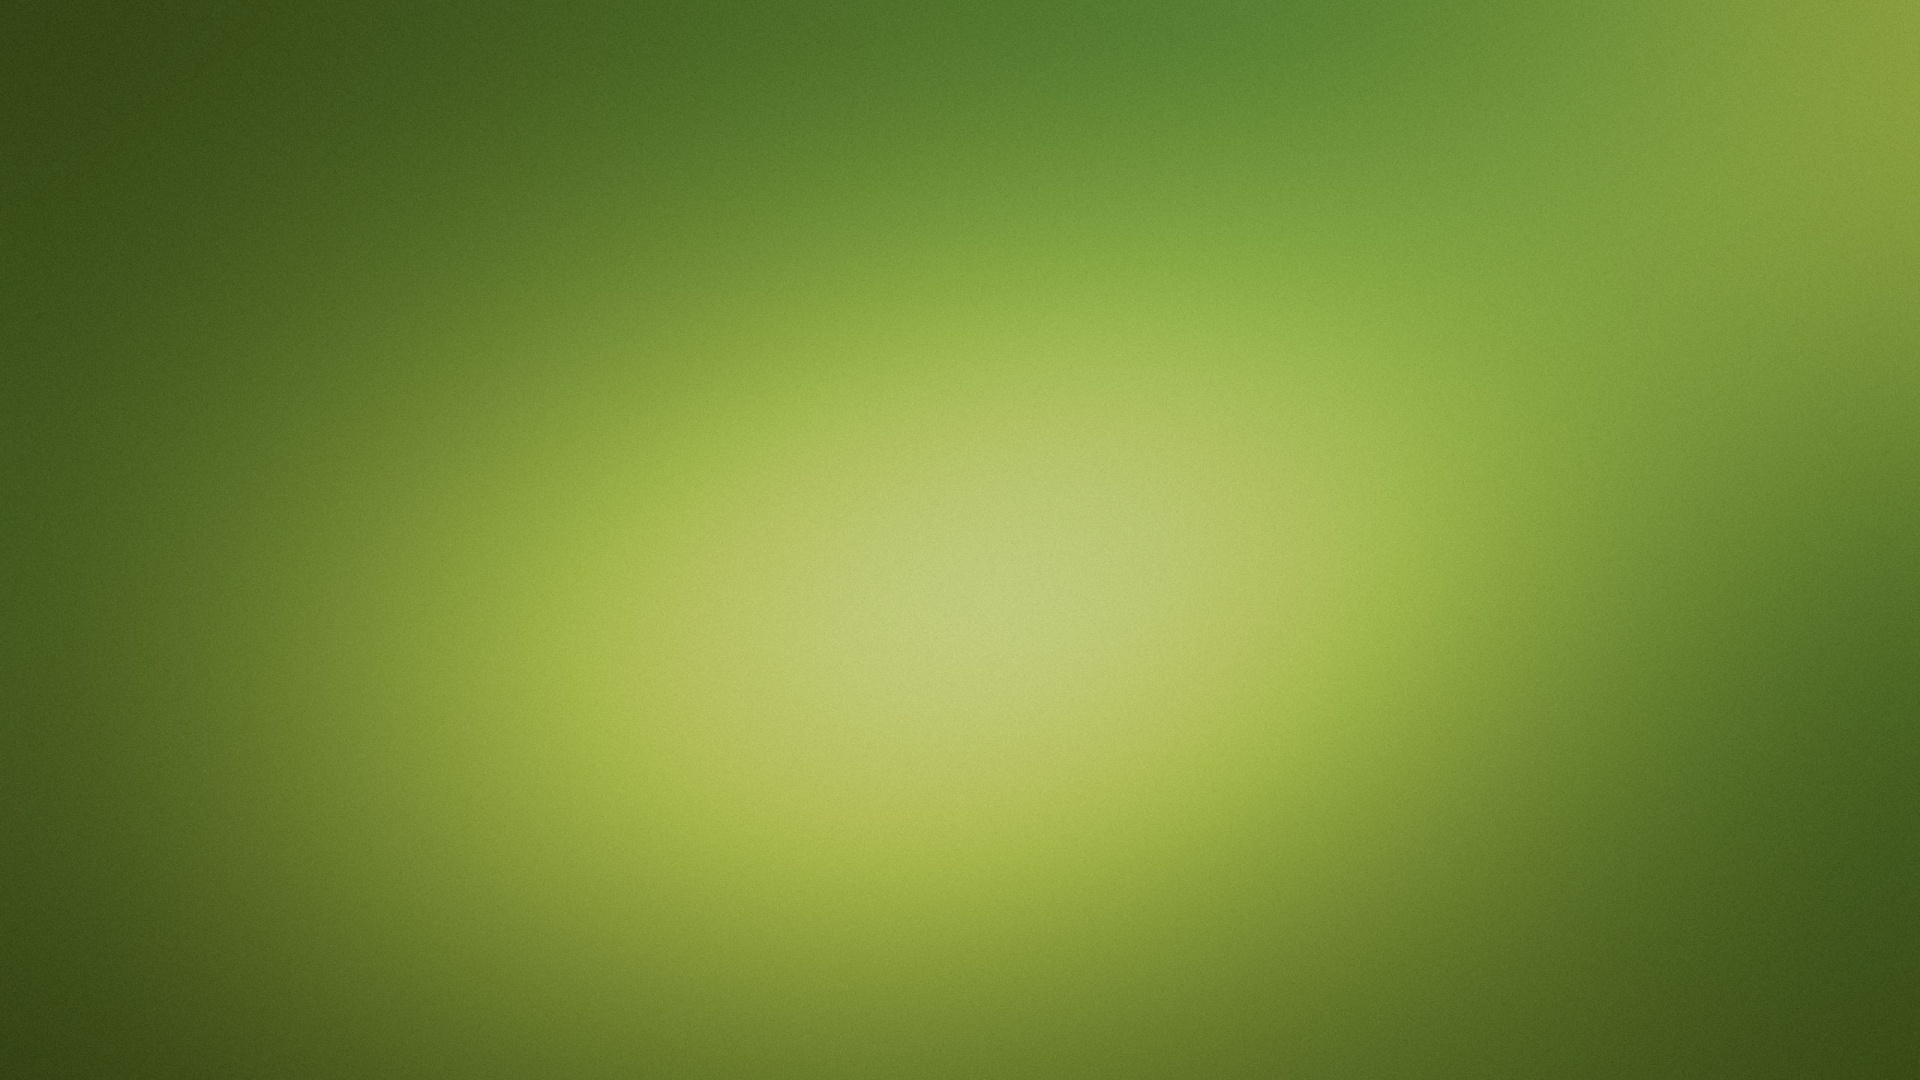 light green background 1920x1080jpg 1920x1080